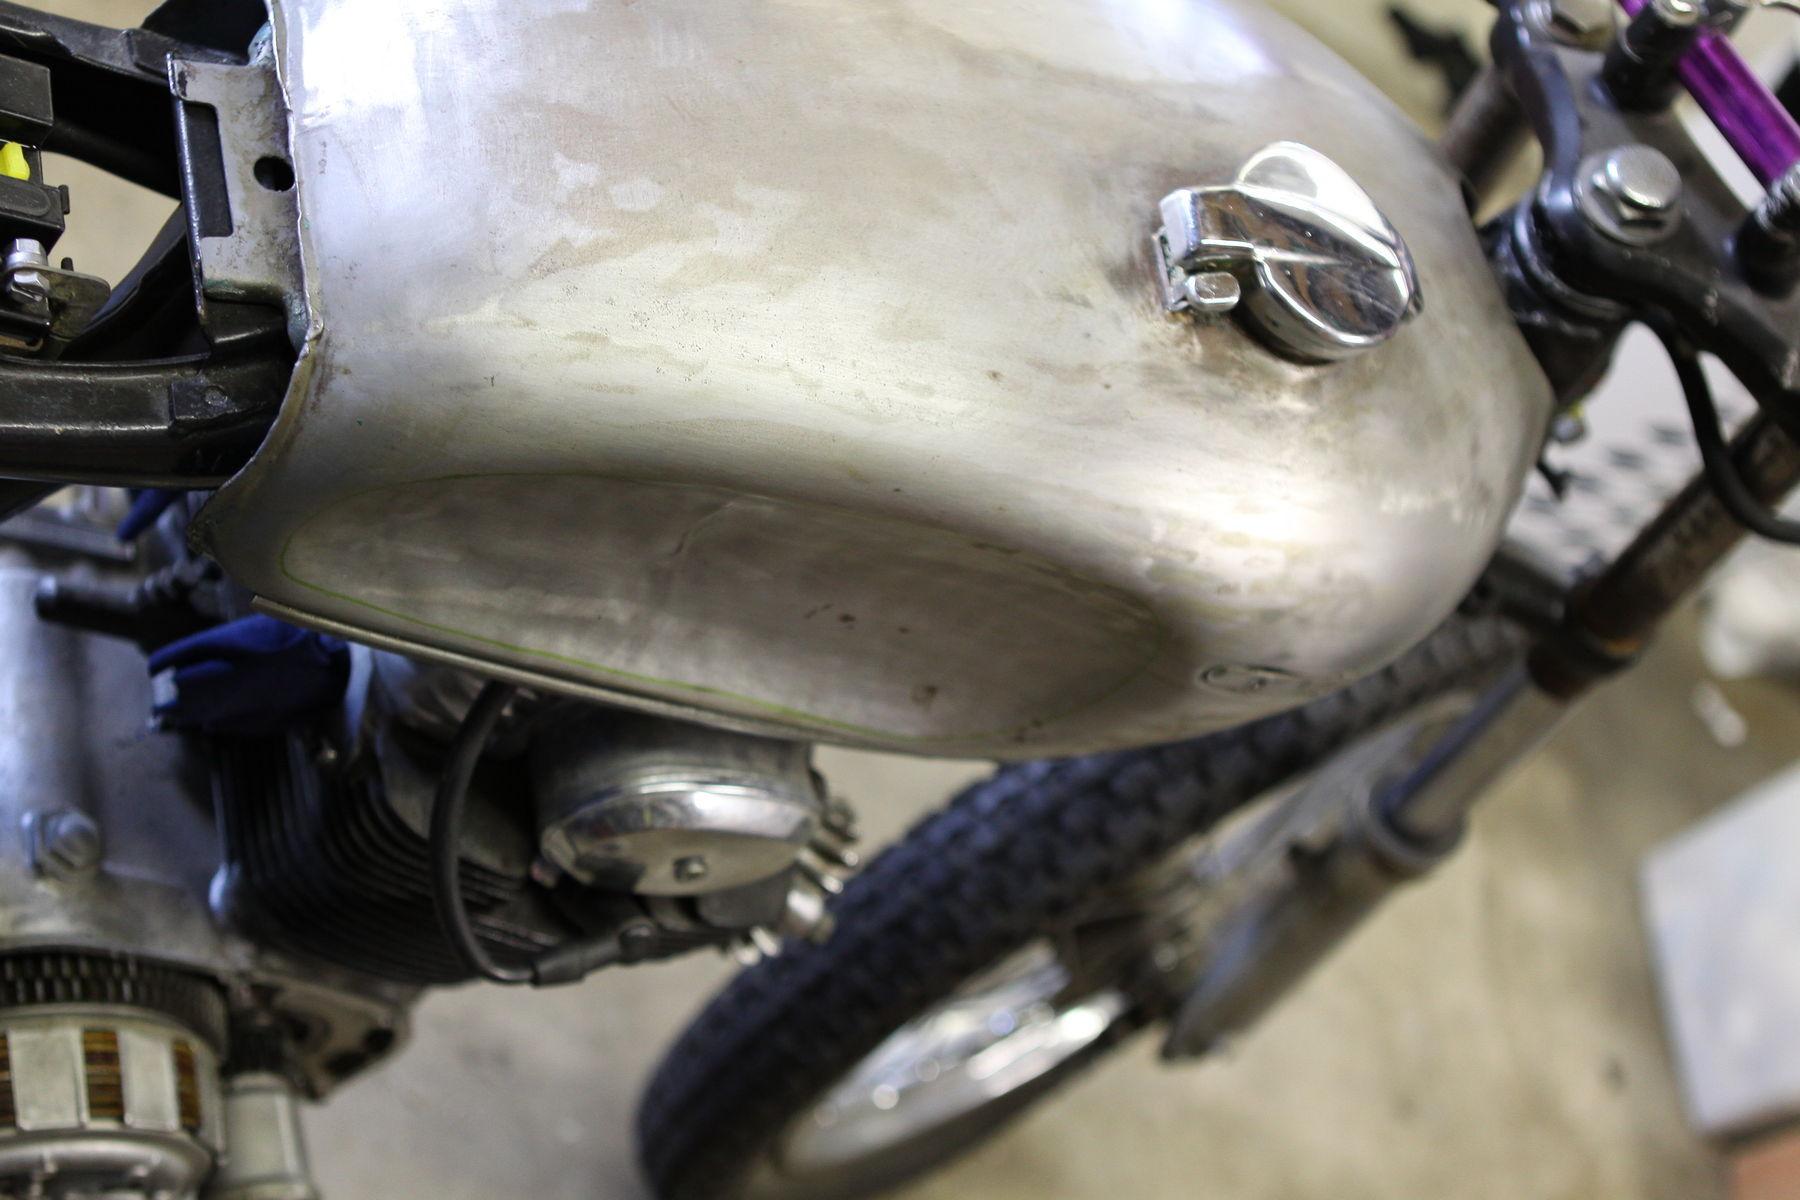 1973 Honda CB350G   Tank prep